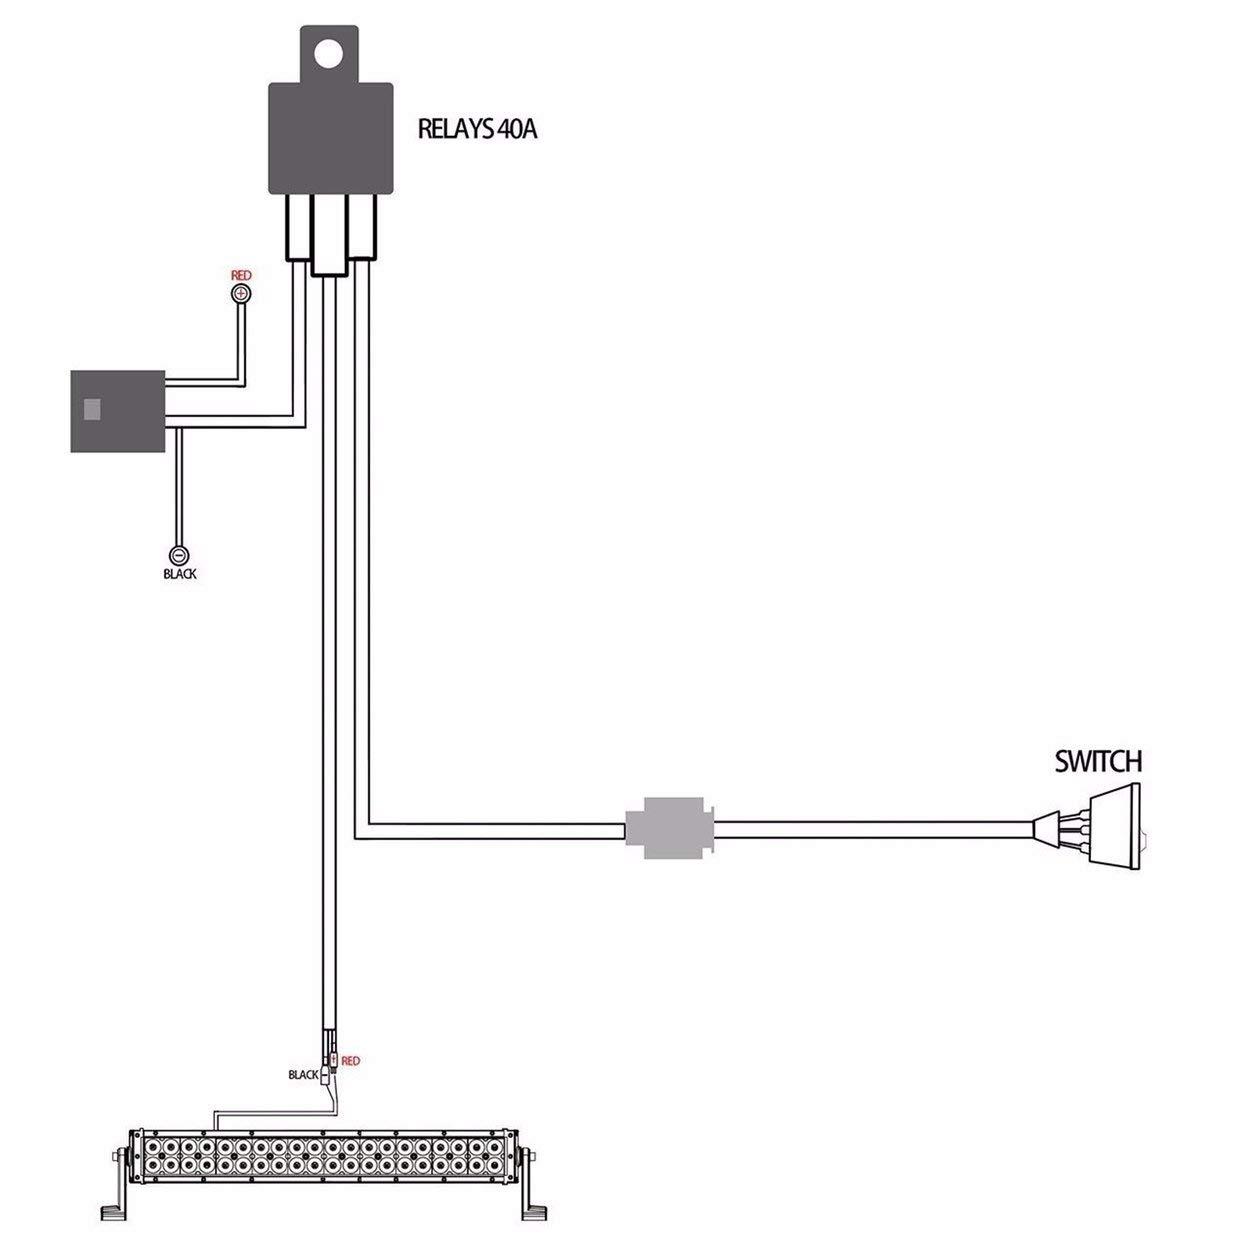 Lorenlli Telar del kit del arn/és de cableado de la luz antiniebla universal 12V 40A para trabajo HID Barra de luces de conducci/ón con fusible e interruptor de rel/é